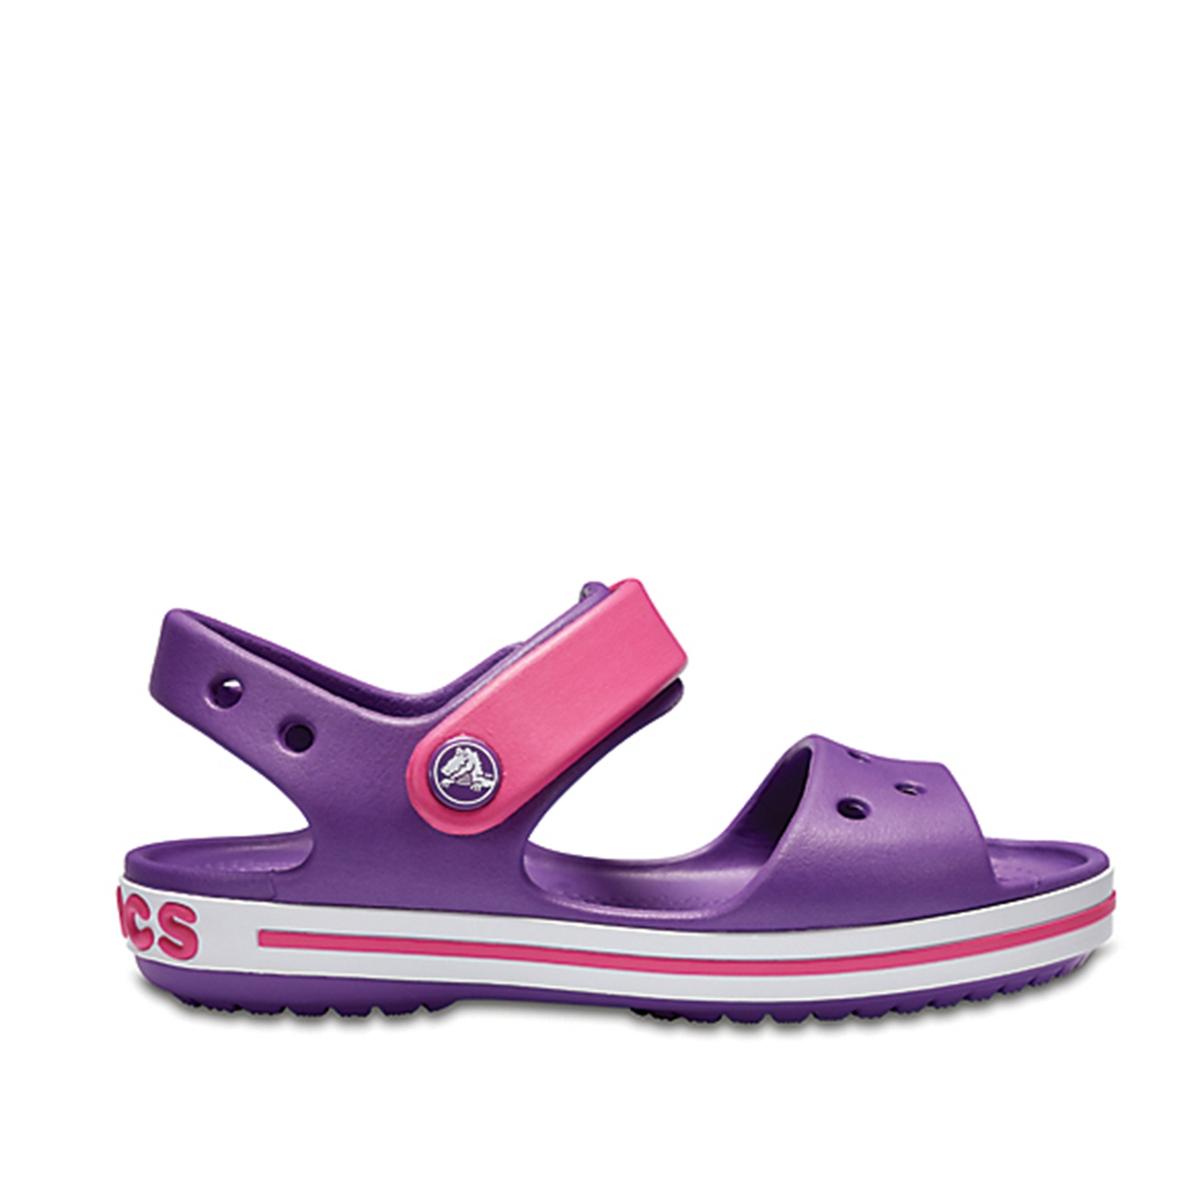 Сандалии La Redoute Crocband 32/33 фиолетовый цены онлайн